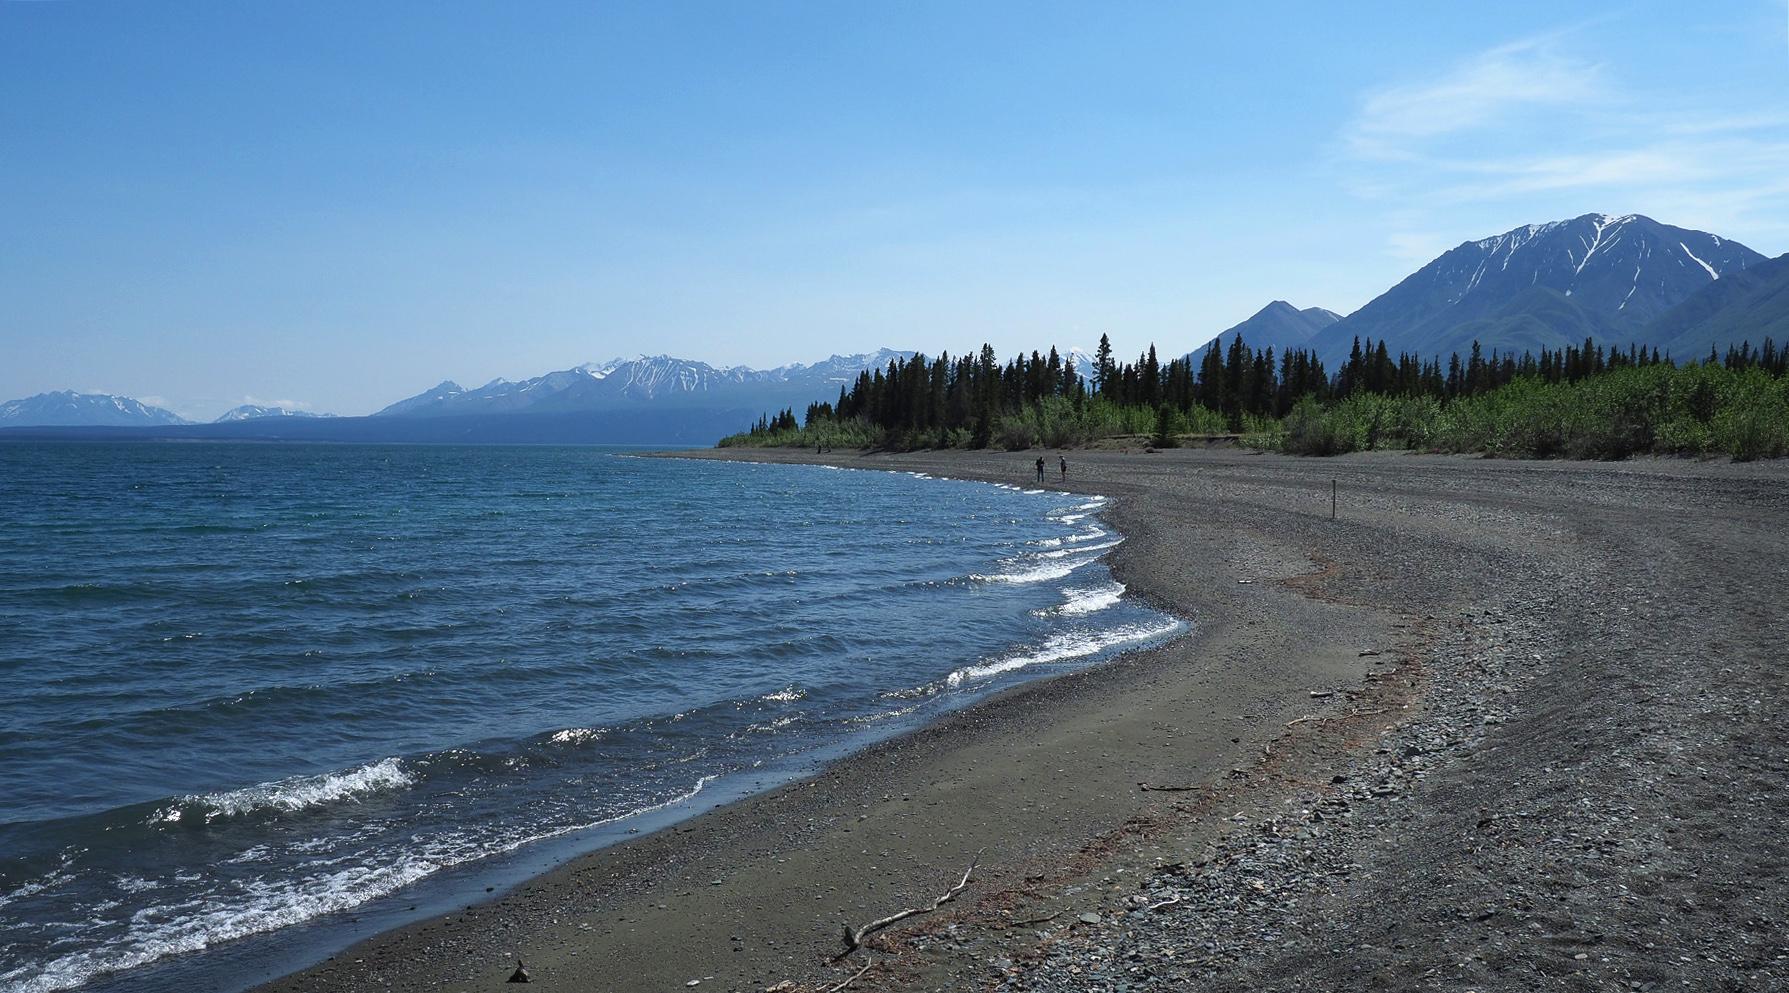 Kluane Lake Wanderung und Camping